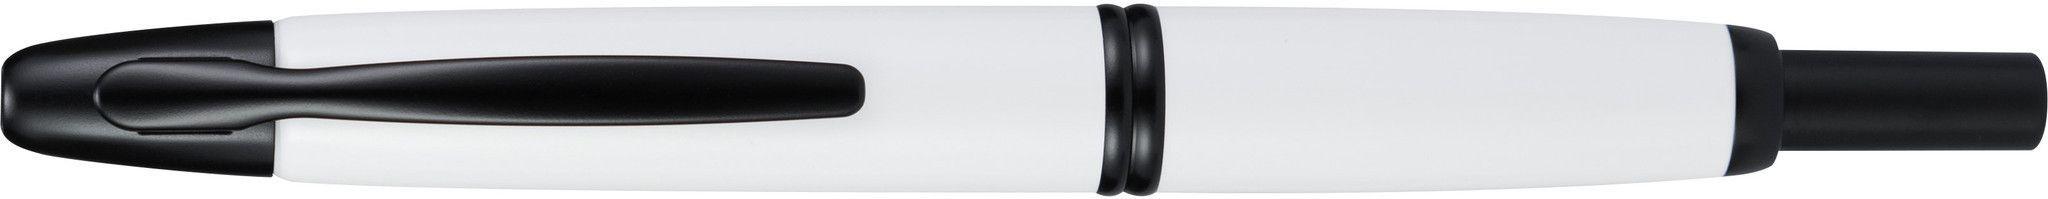 Pilot Vanishing Point White with Black Matte Trim Broad Fountain Pen